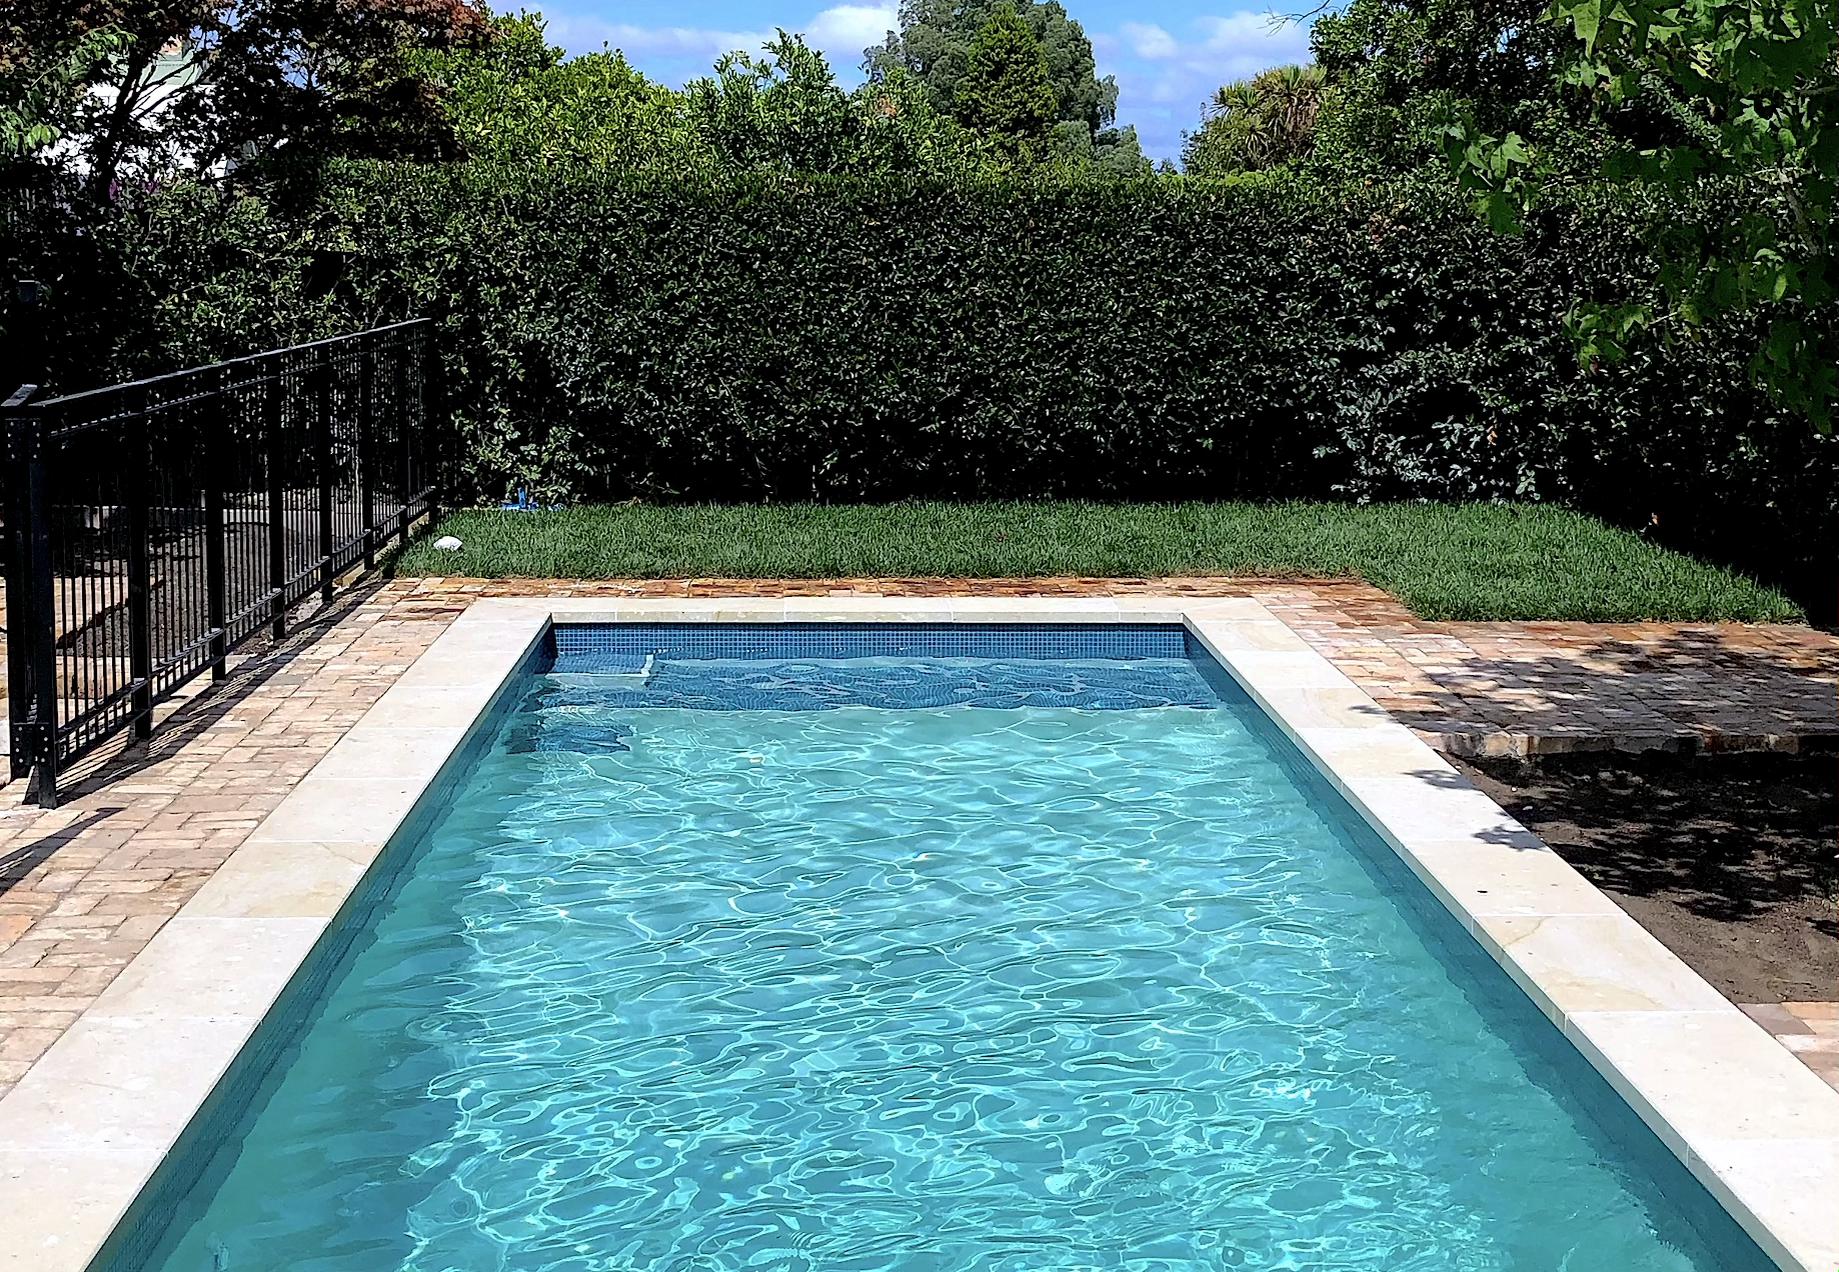 8.5x3.5m pool by Mobius Pools